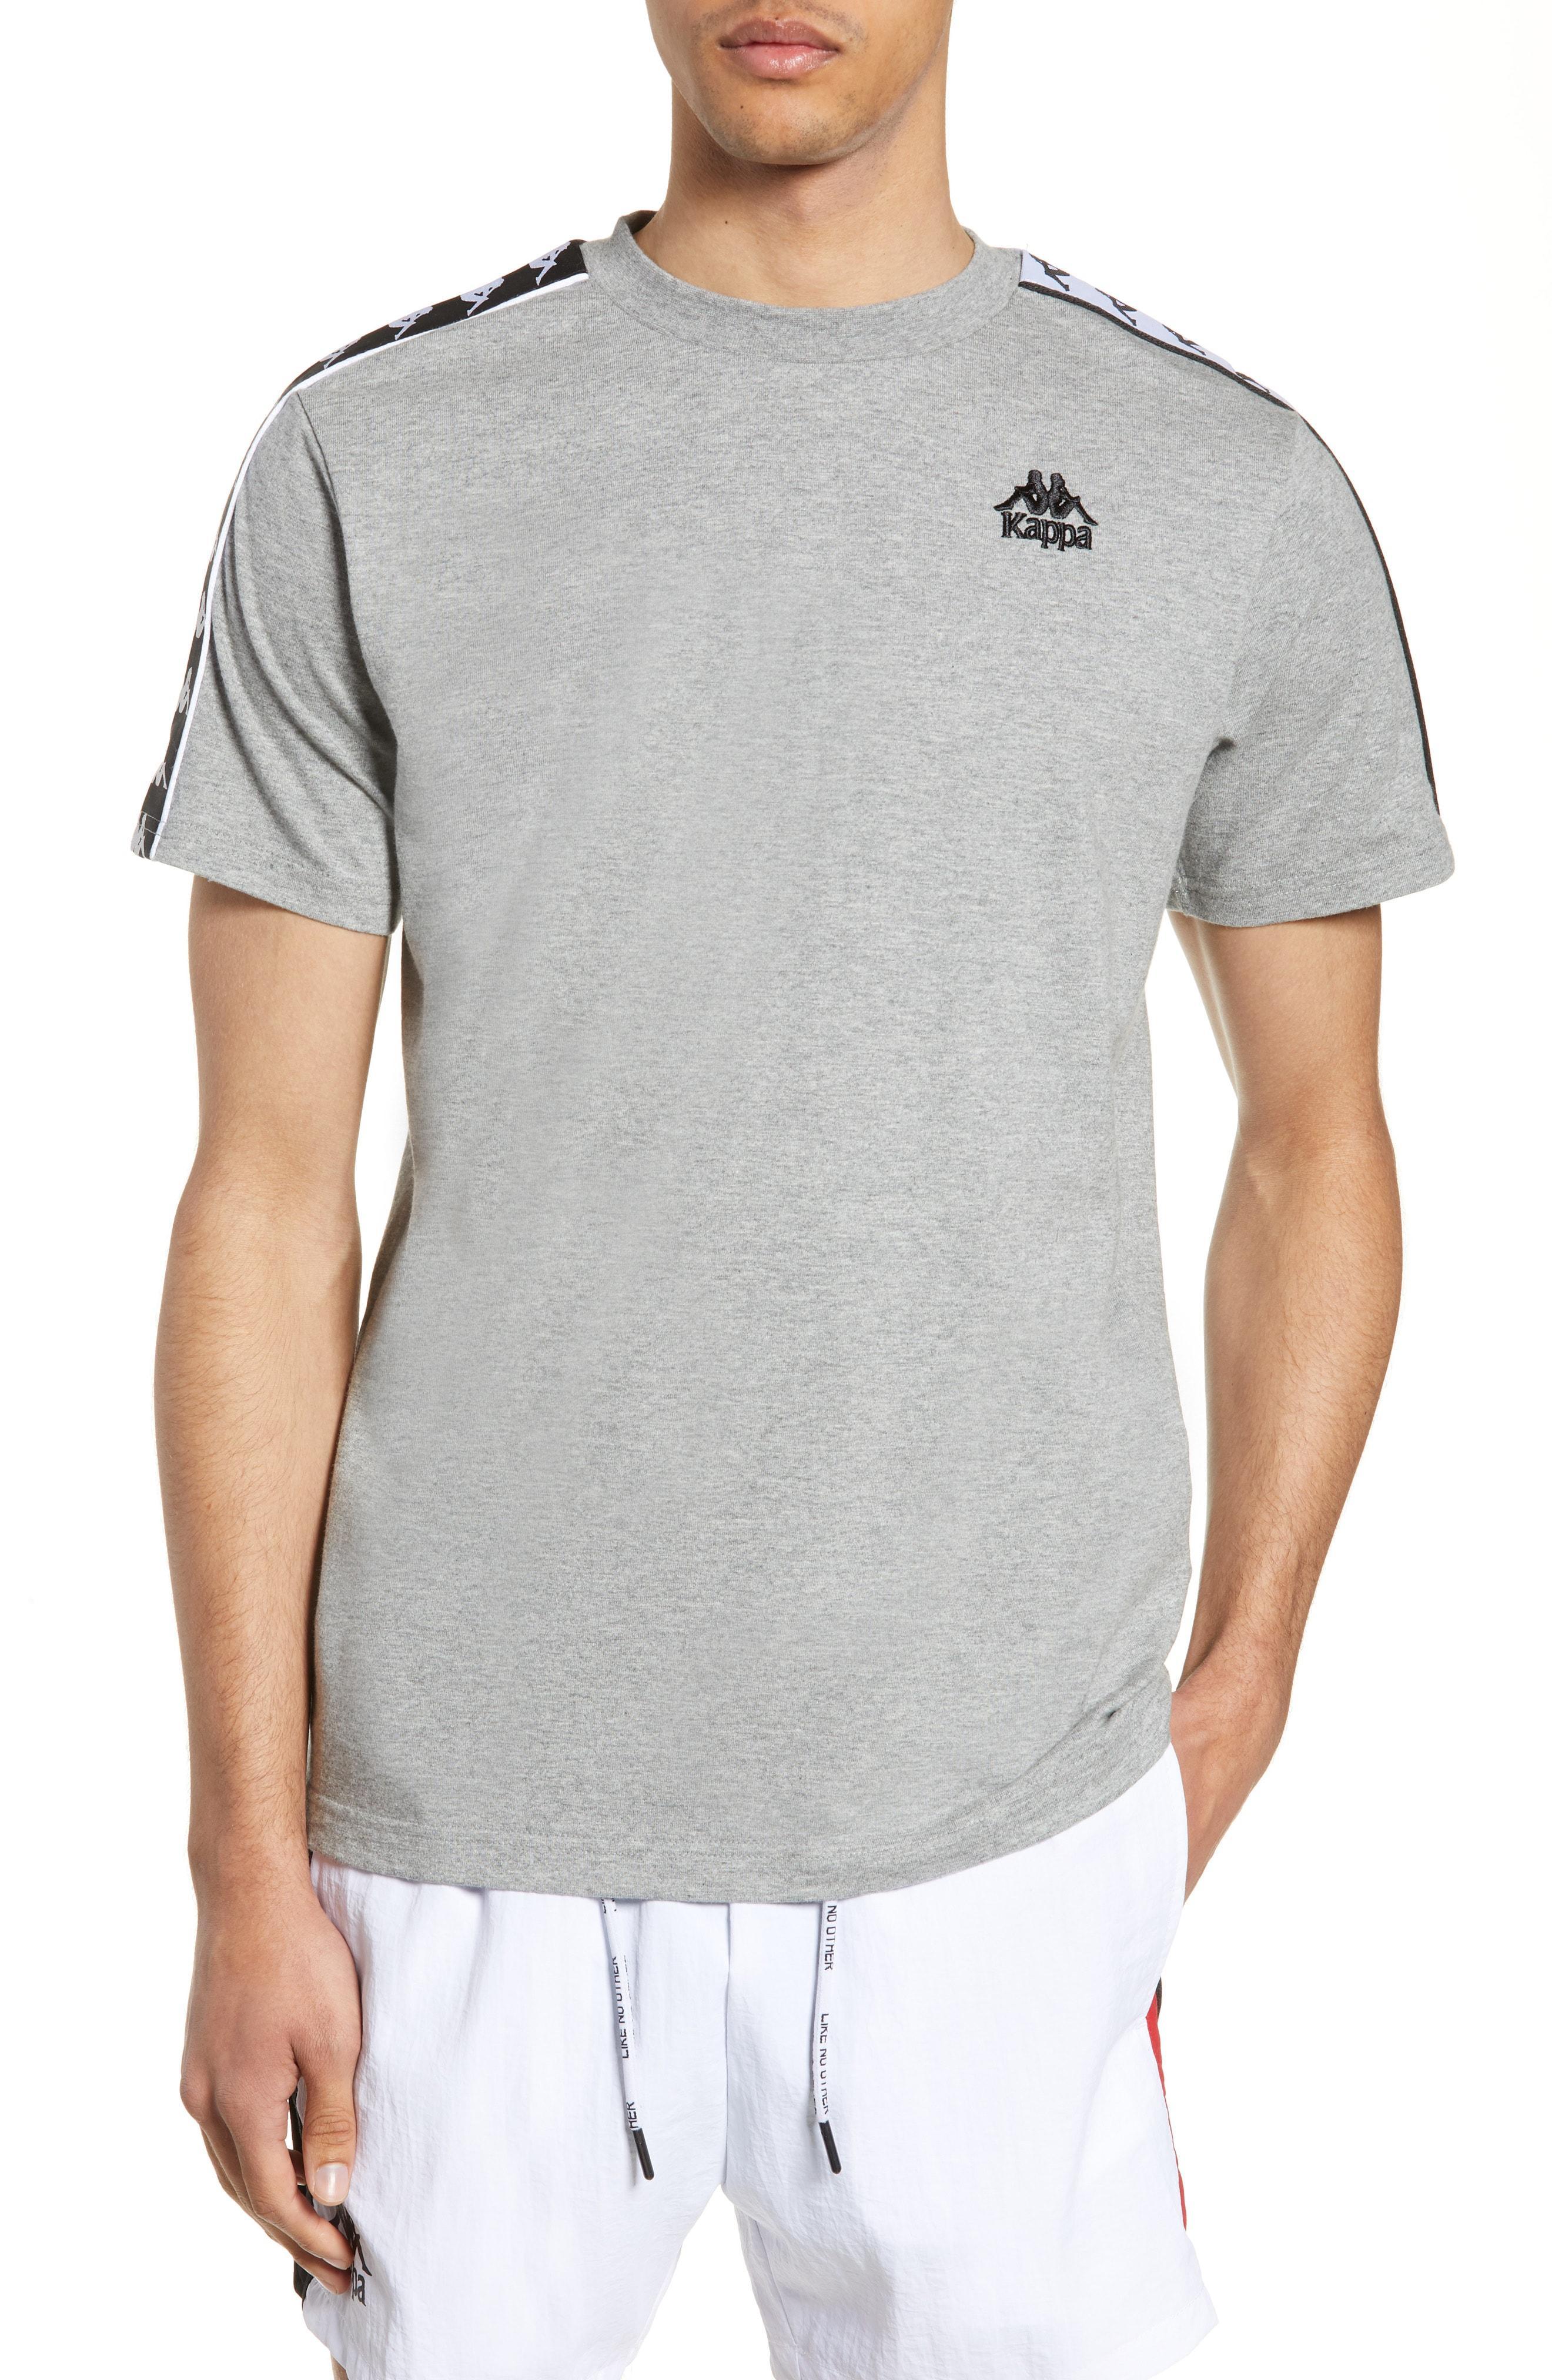 e99469f992 Kappa 222 Banda Charlton T-shirt in Gray for Men - Lyst